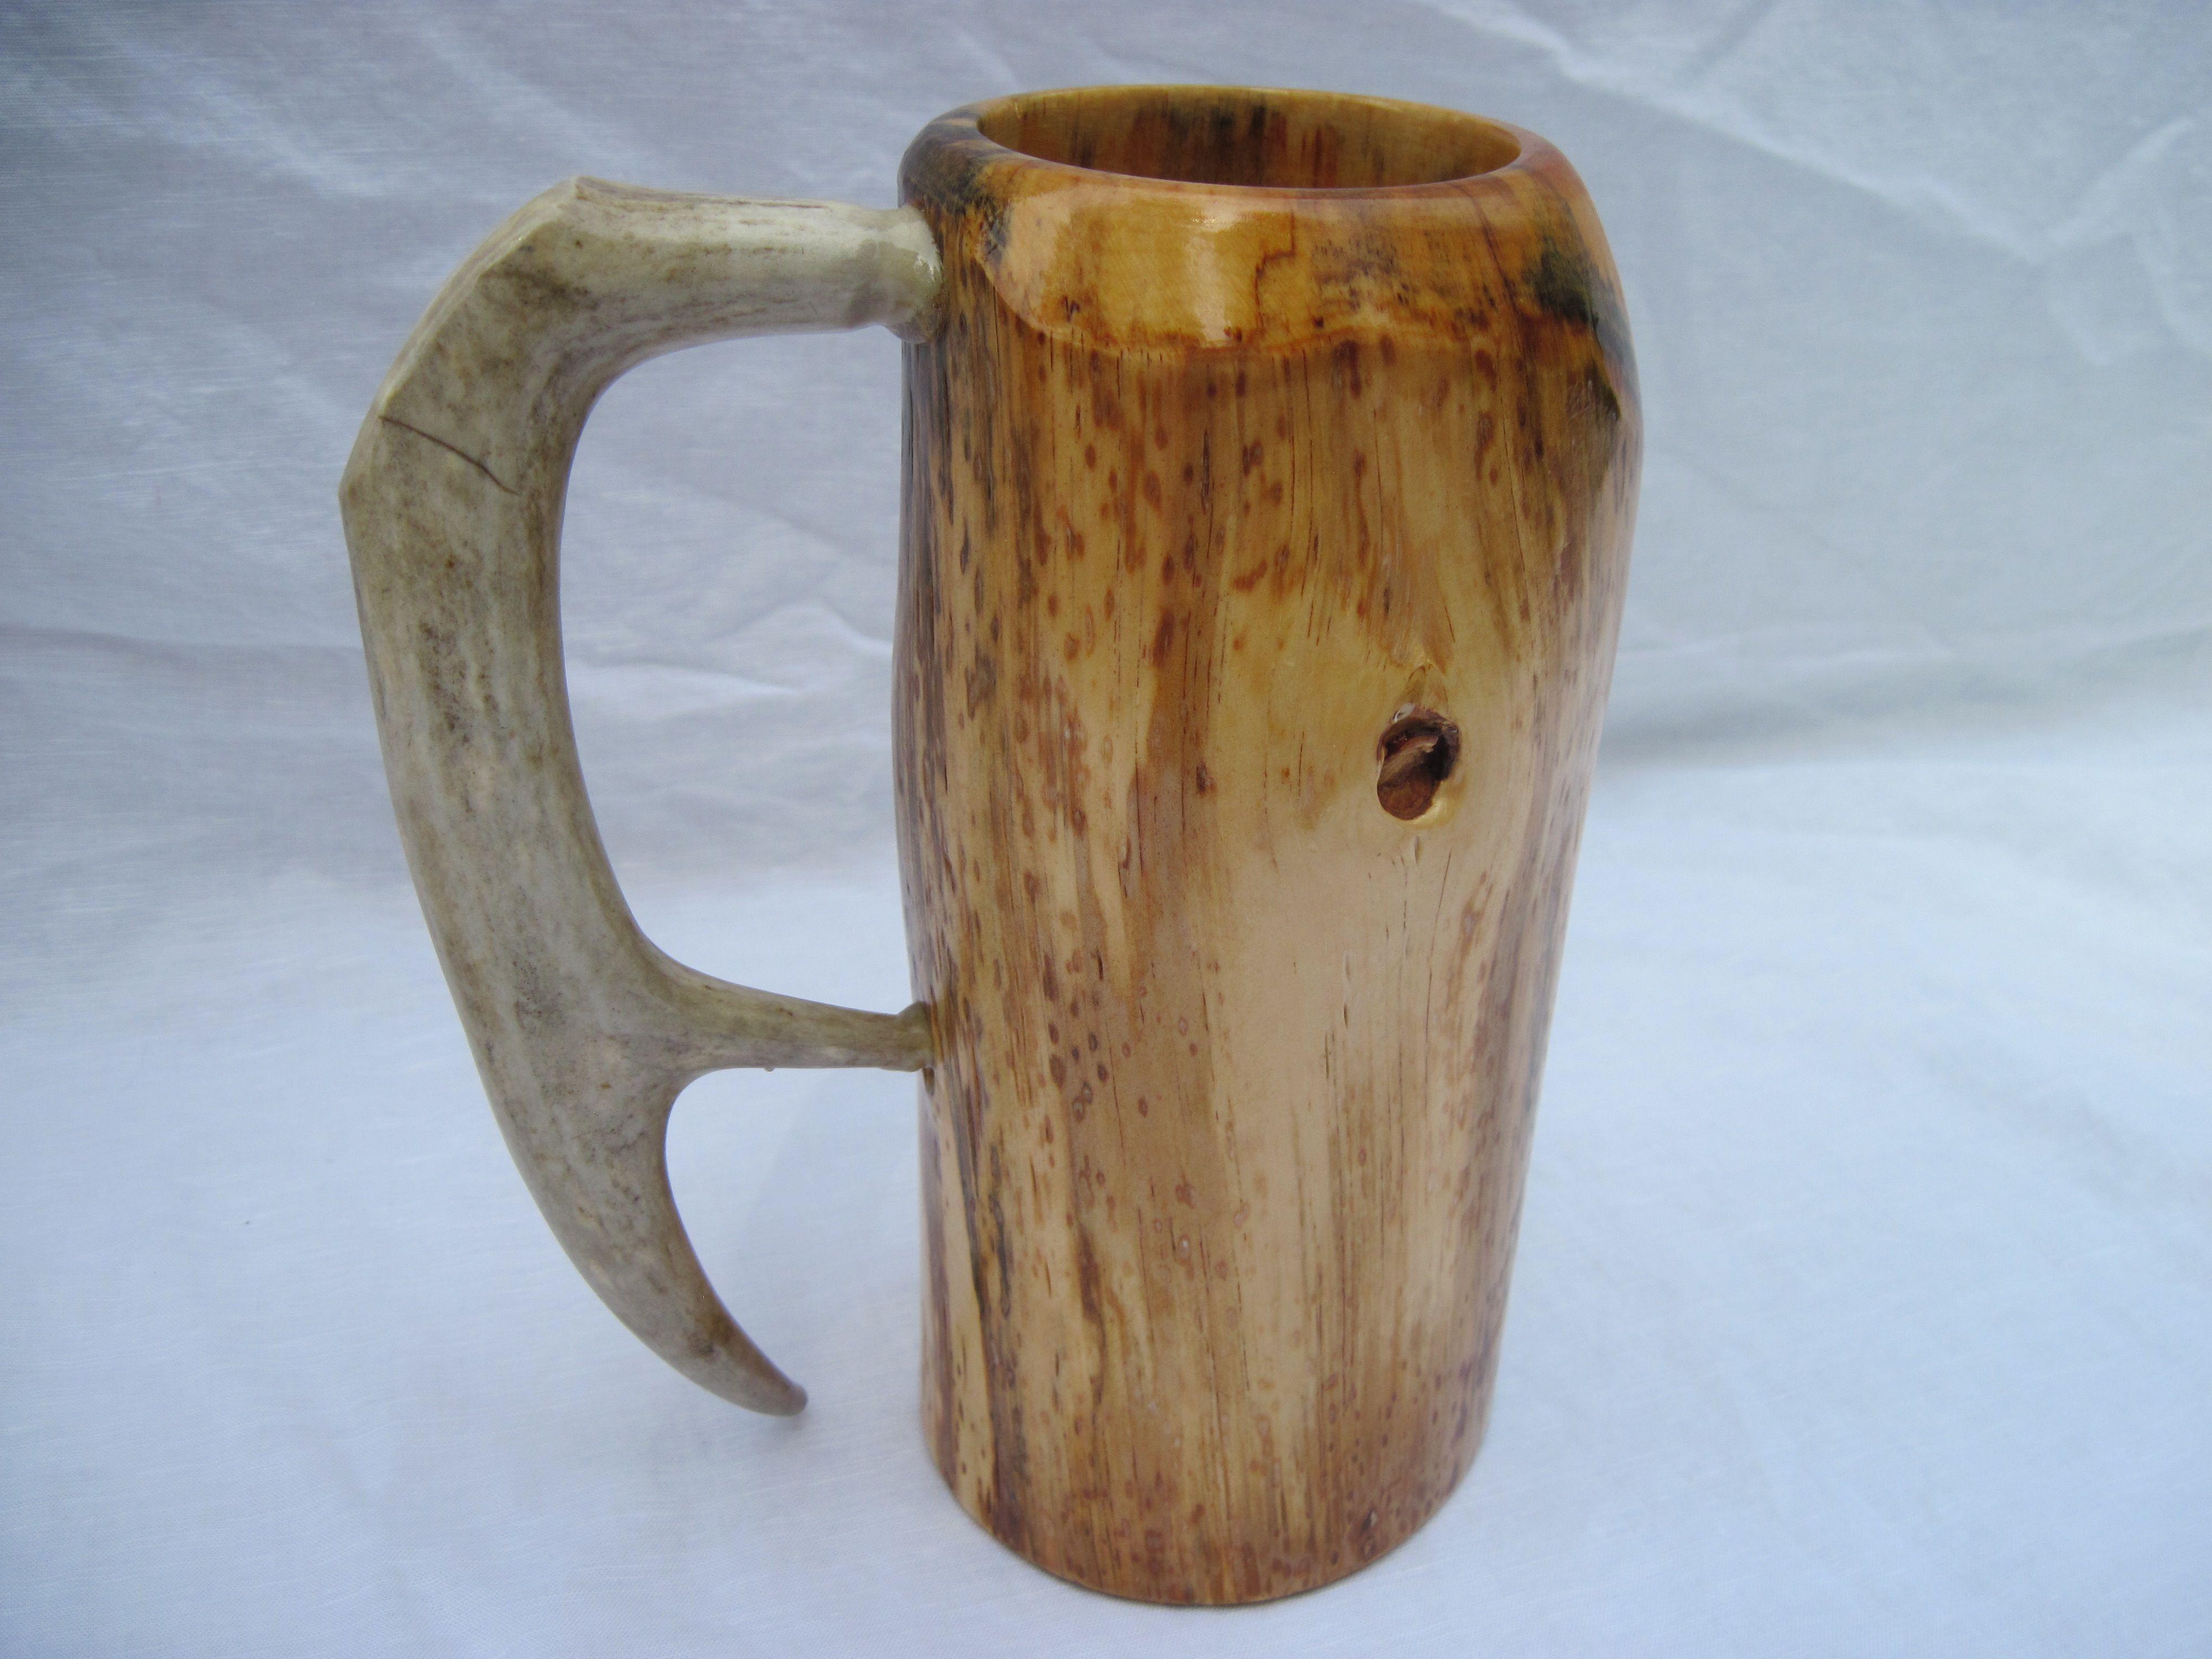 Antler Handle Beer Mug Wooden Mug Sca Tankard Wooden Stein